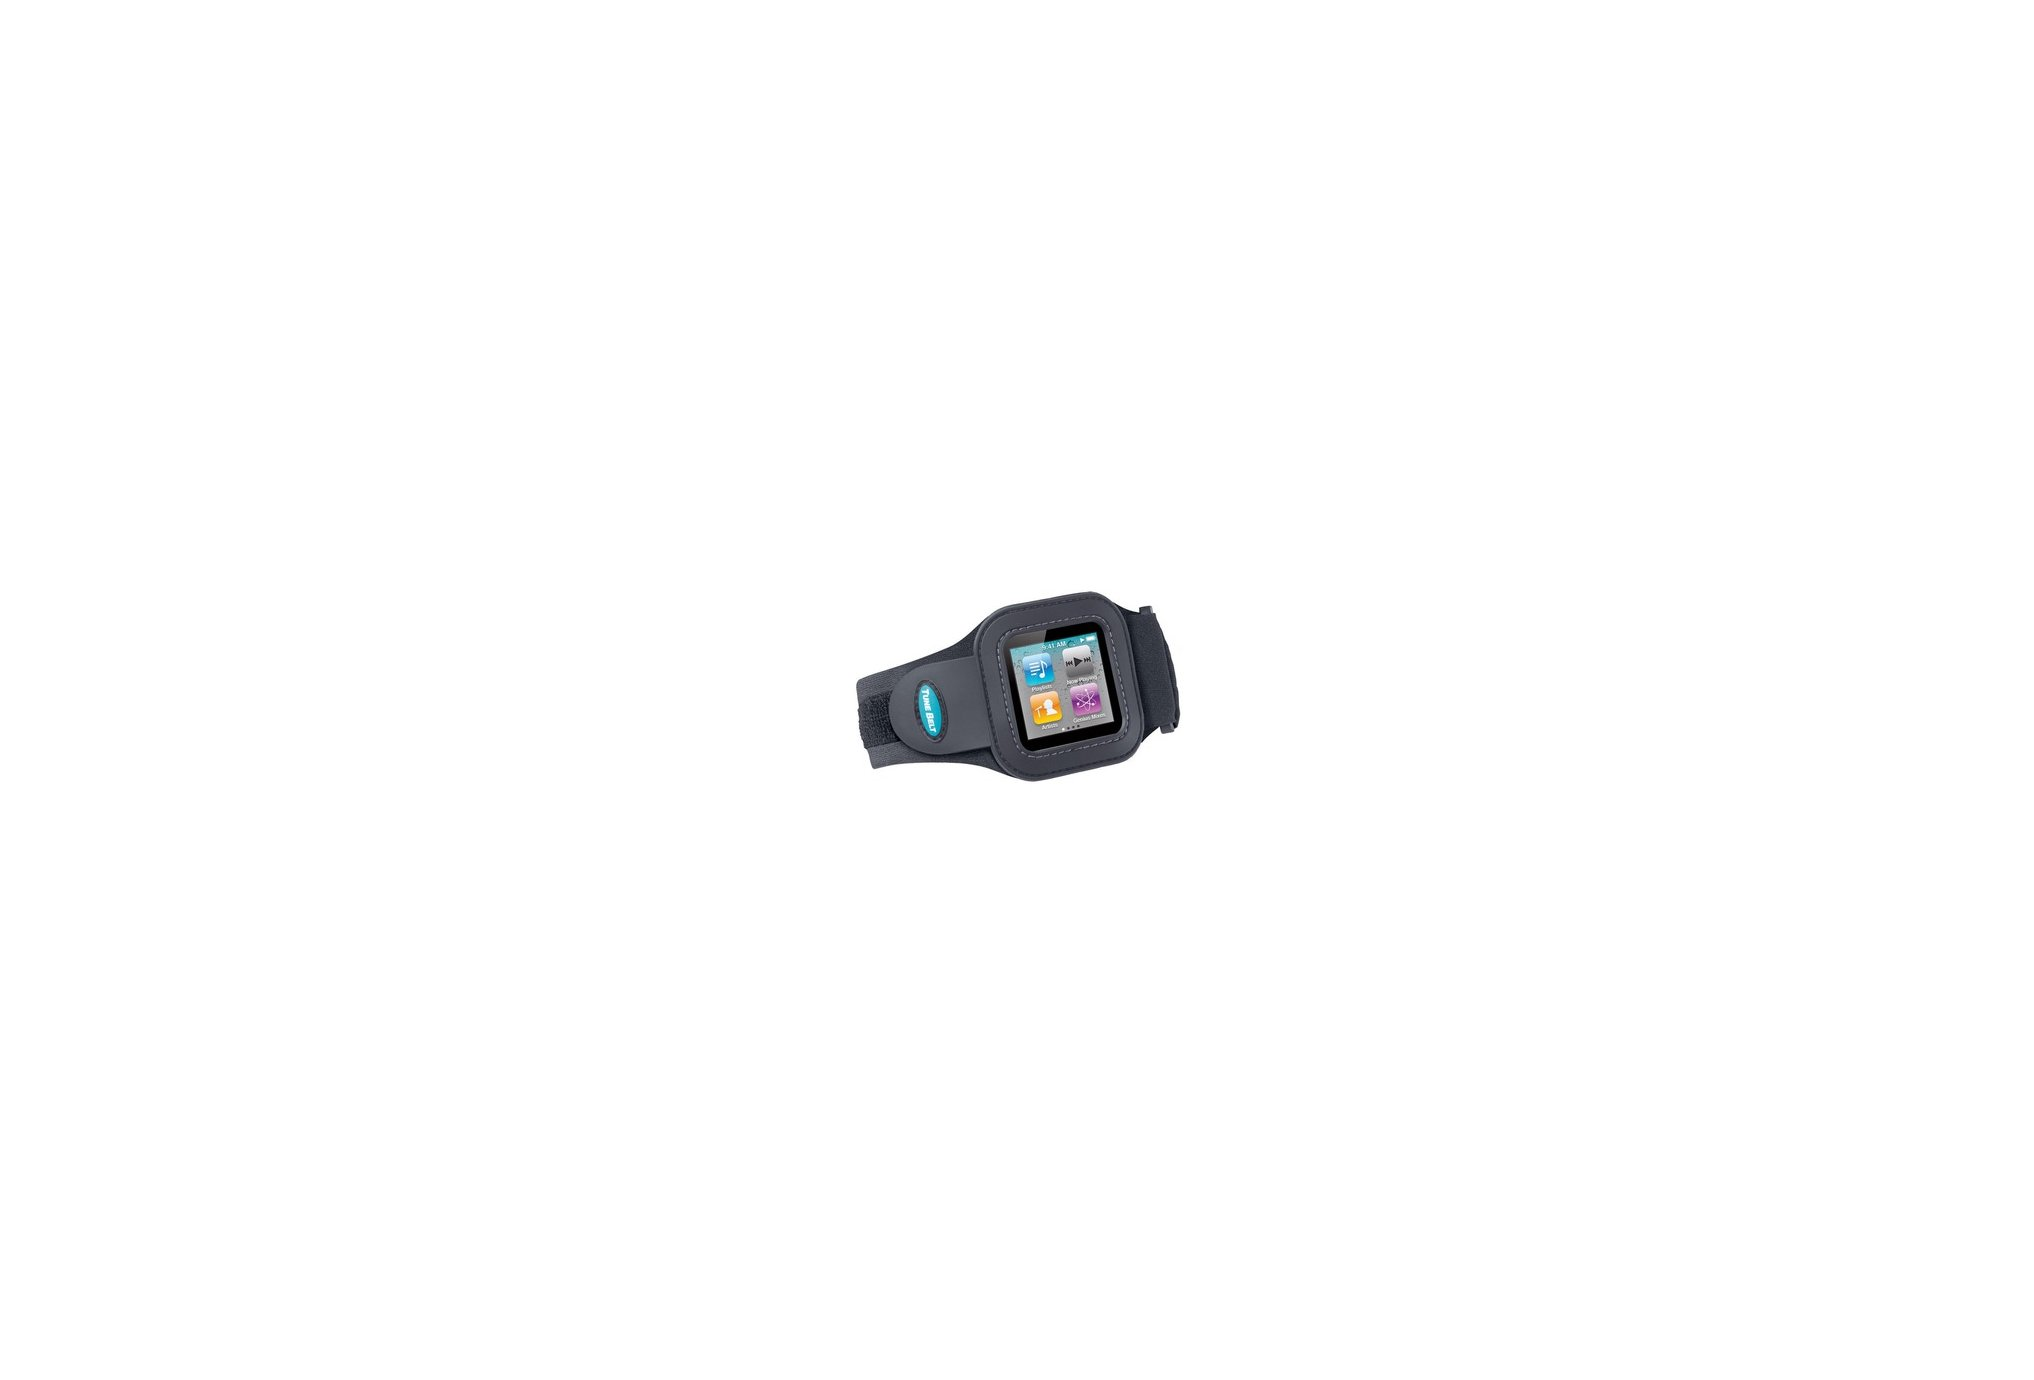 Tune Belt brassard ab76+ ipod nano 6g accessoires téléphone